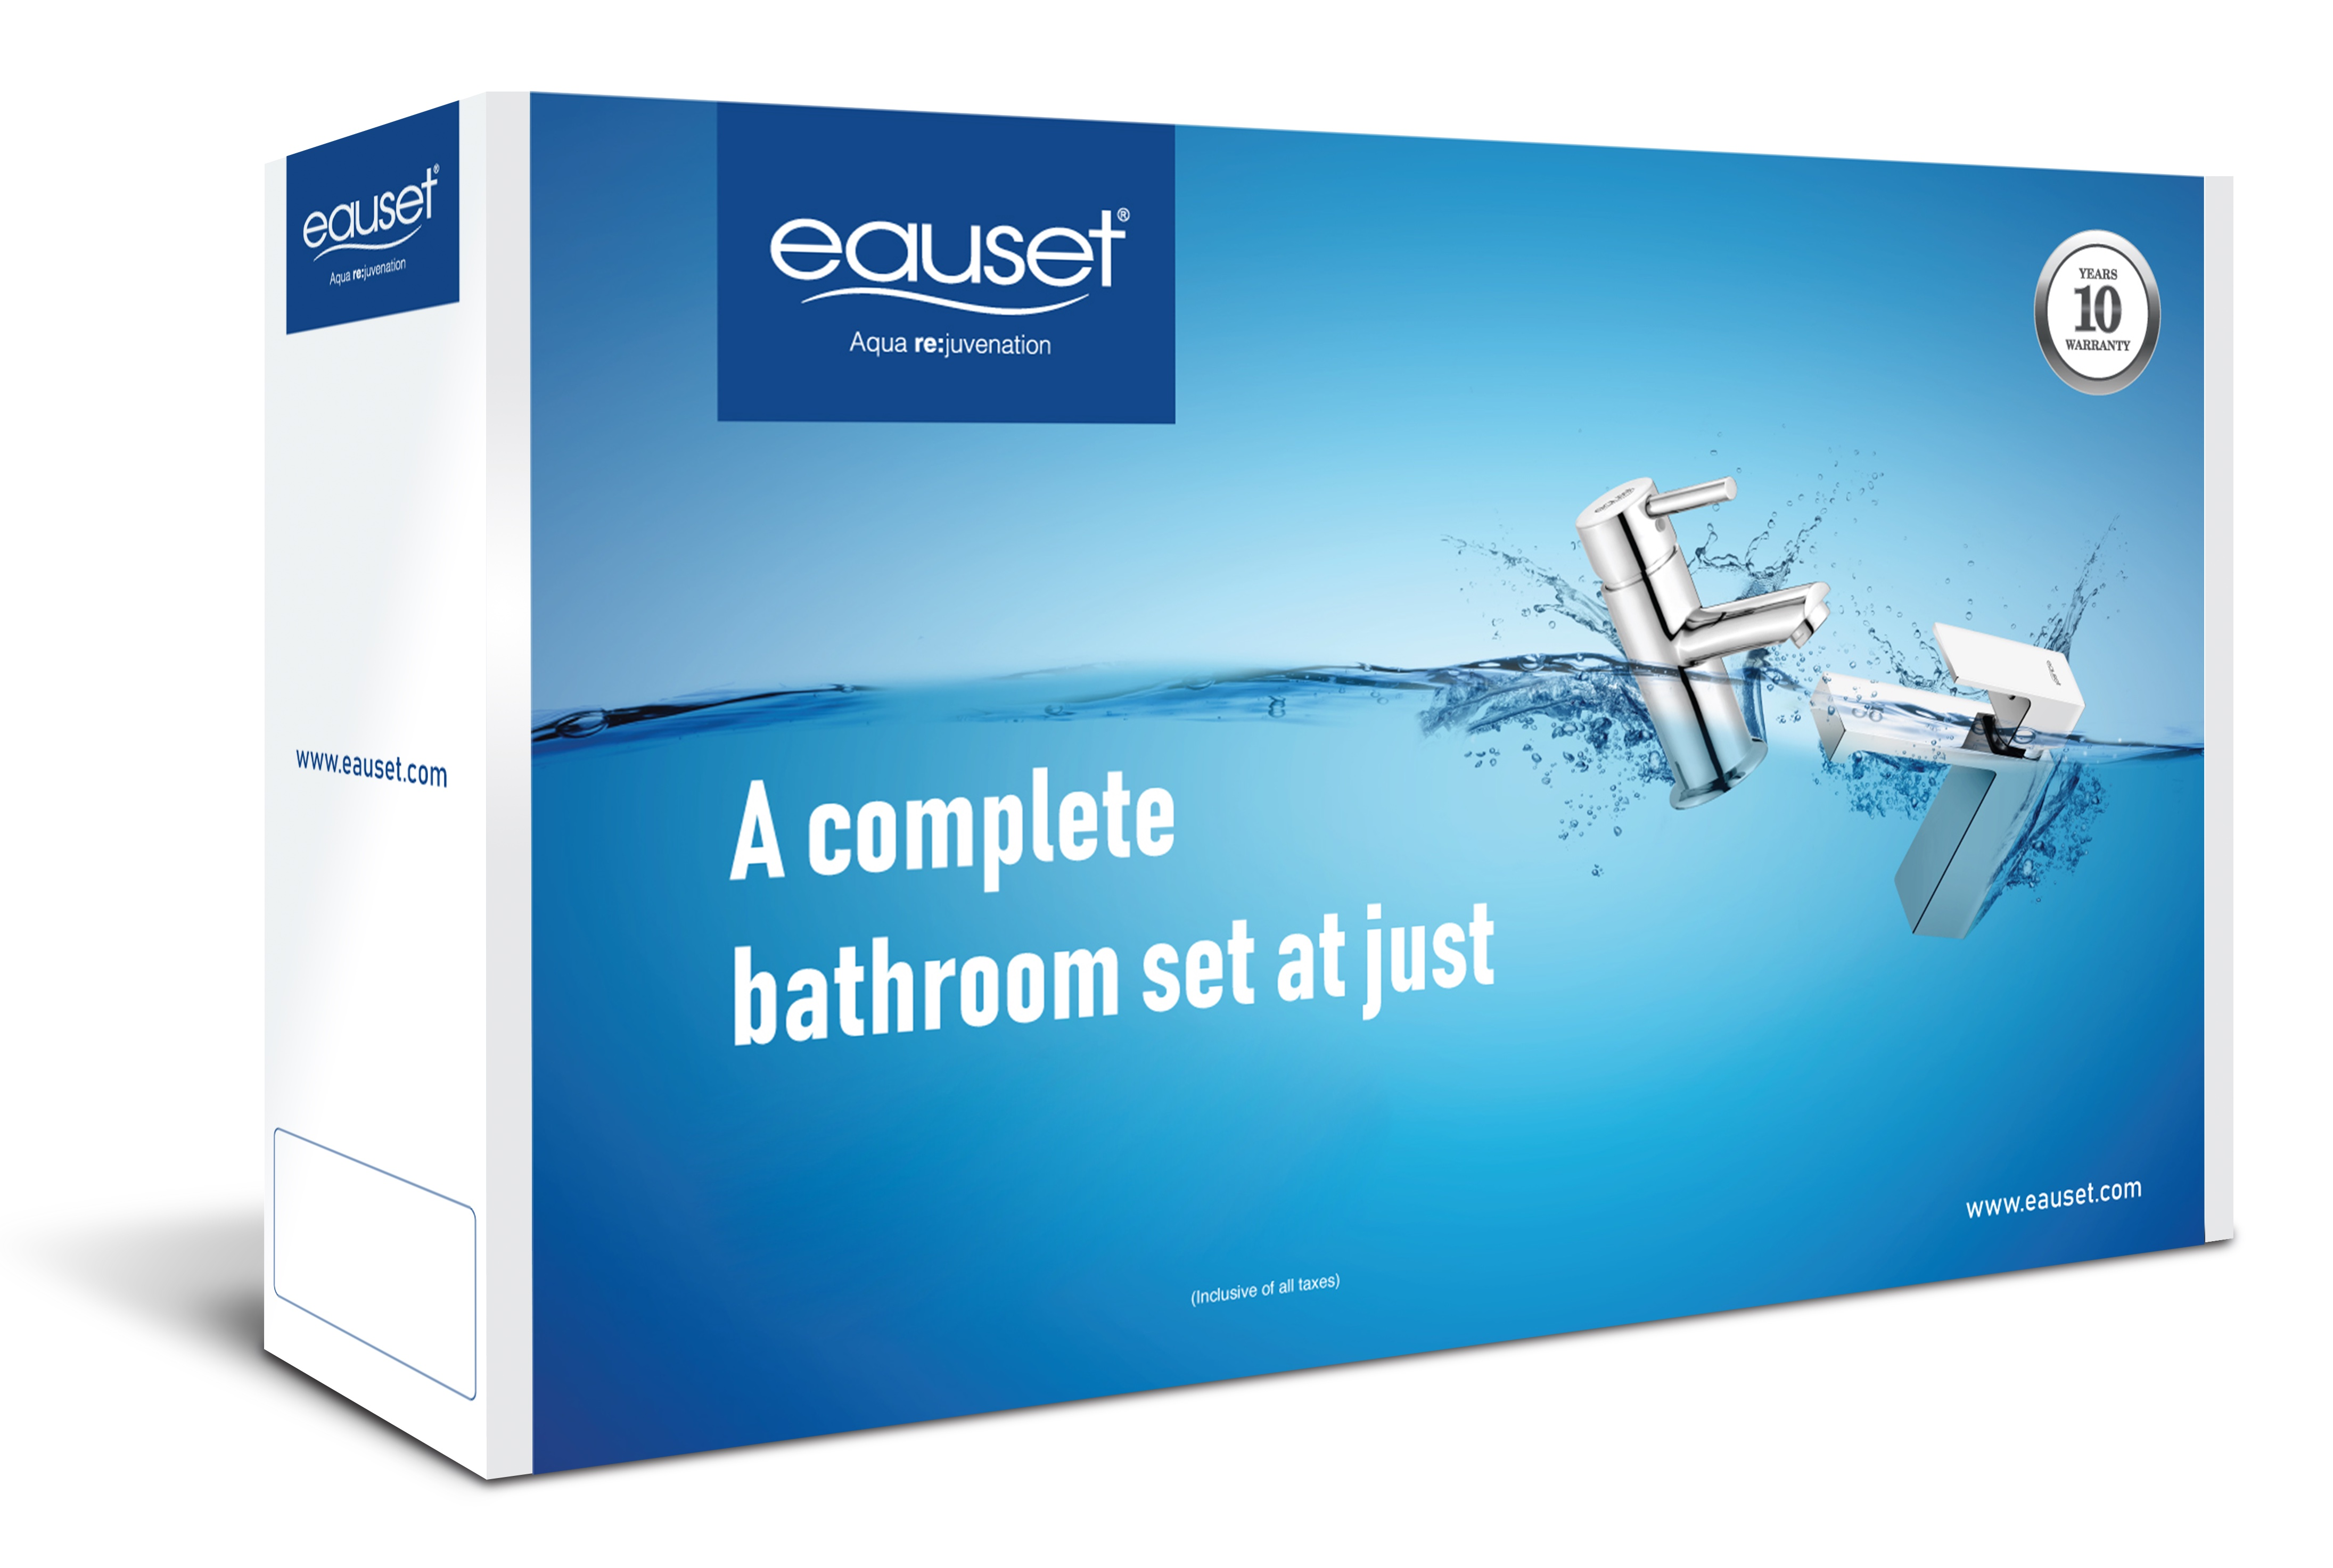 Bath Set -Pillar Cock Long Neck+ Bath Tub Spout + Single Lever Concealed Divertor (High Flow) With Upper Part + Angle Cock- 03 Pcs + Shower With Arm